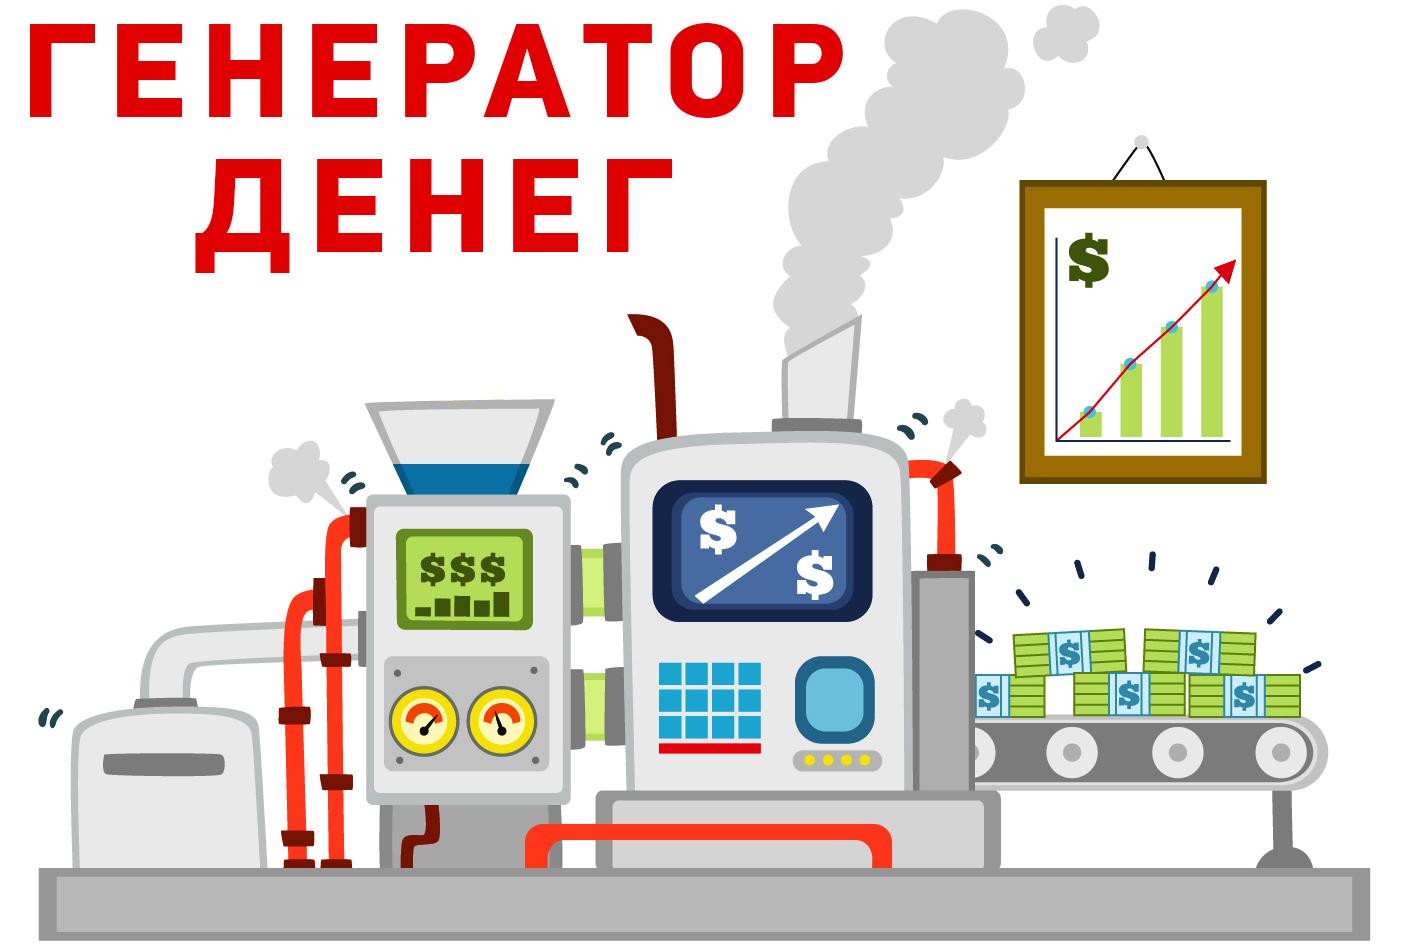 http://u1.platformalp.ru/39871d0cee6ab3debf7e05cd7a6d5cf4/ebfa5cf63a08c41bbee2c224bf32c46f.jpg